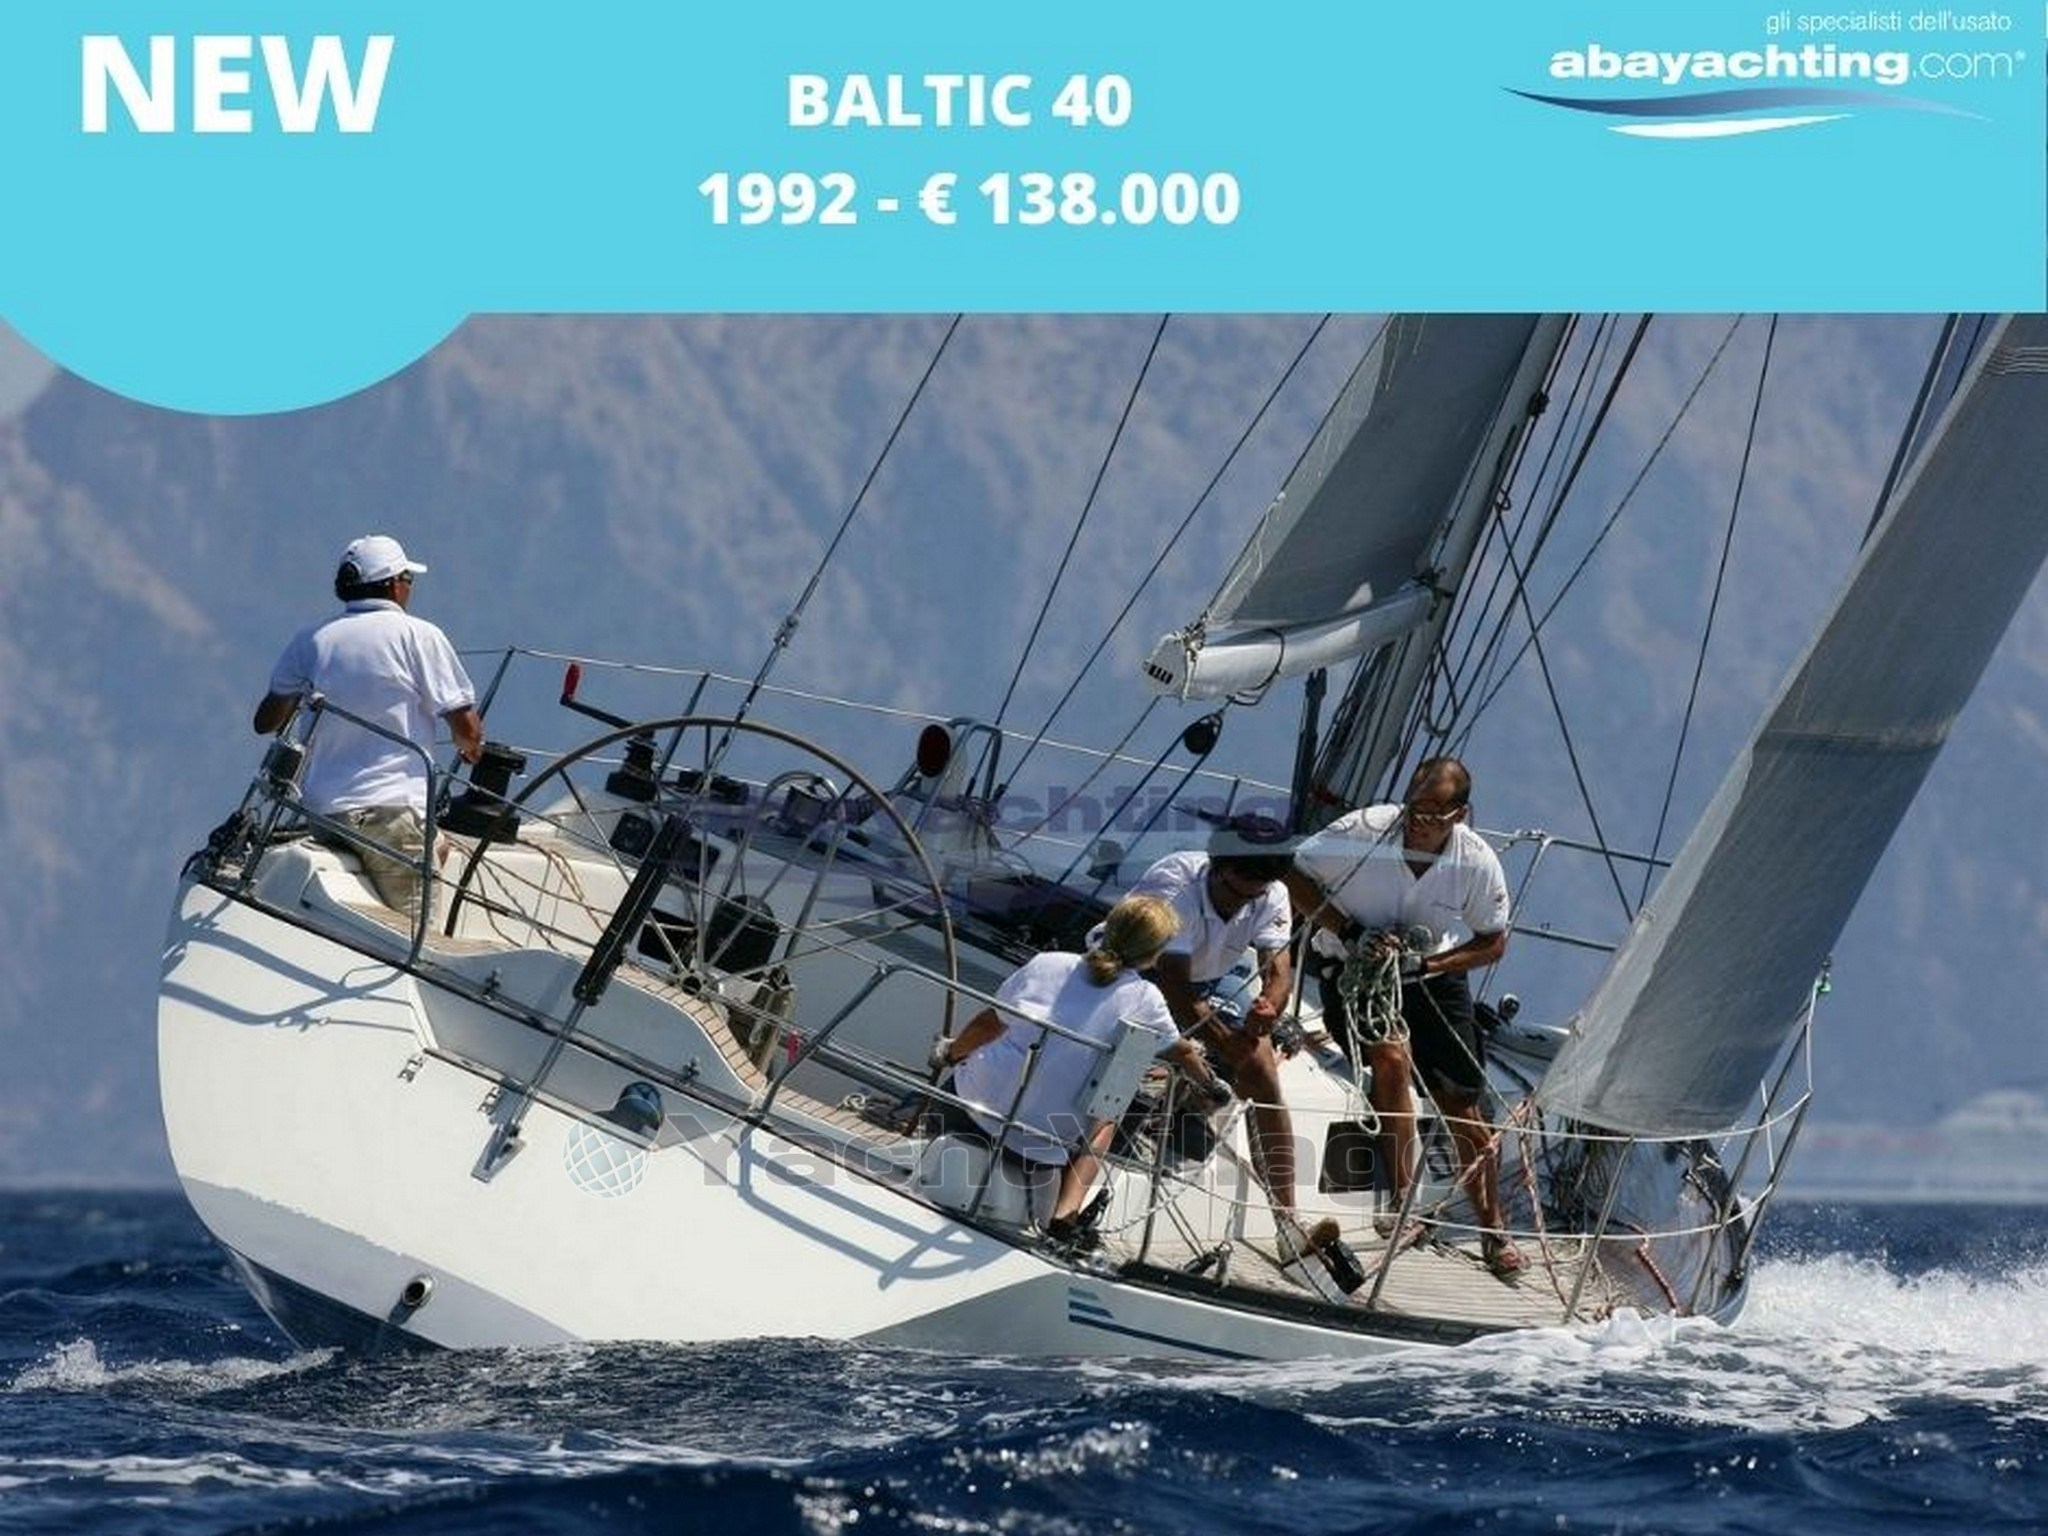 ABAYACHTING NUOVO ARRIVO BALTIC 40